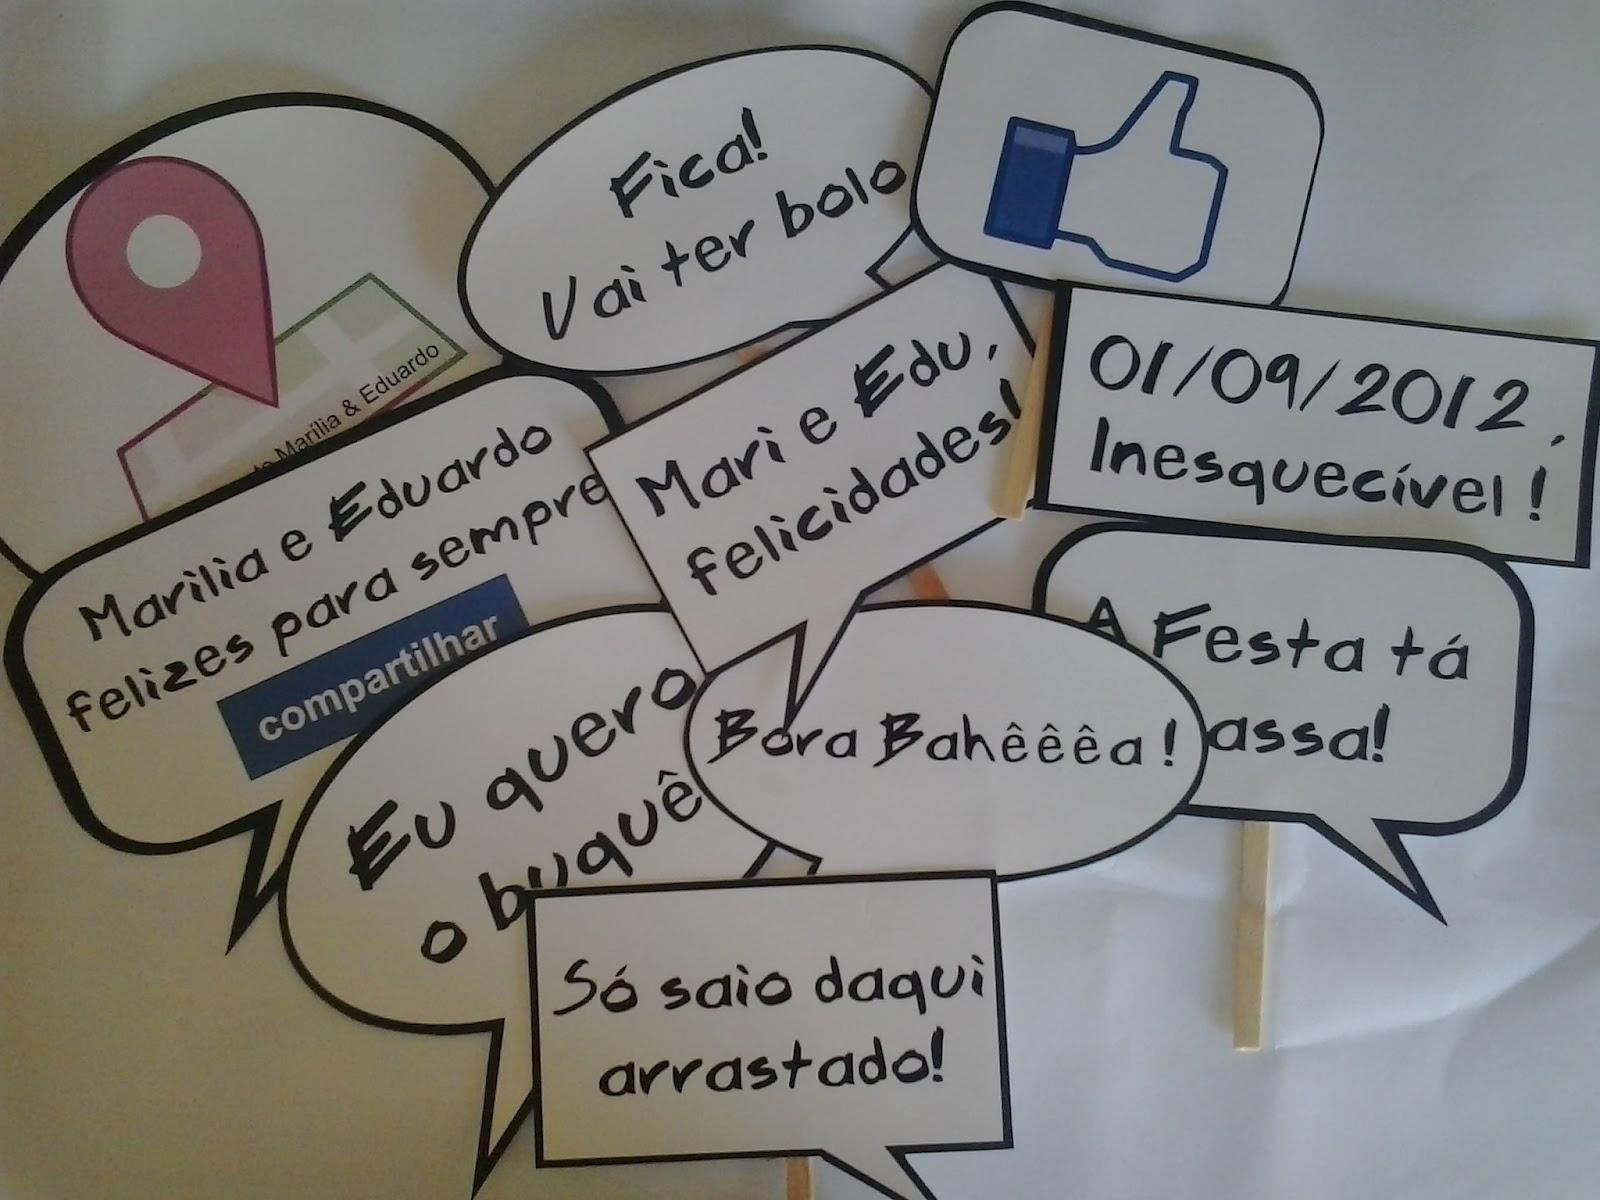 Fonte: http://casaroucomprarbike.blogspot.com.br